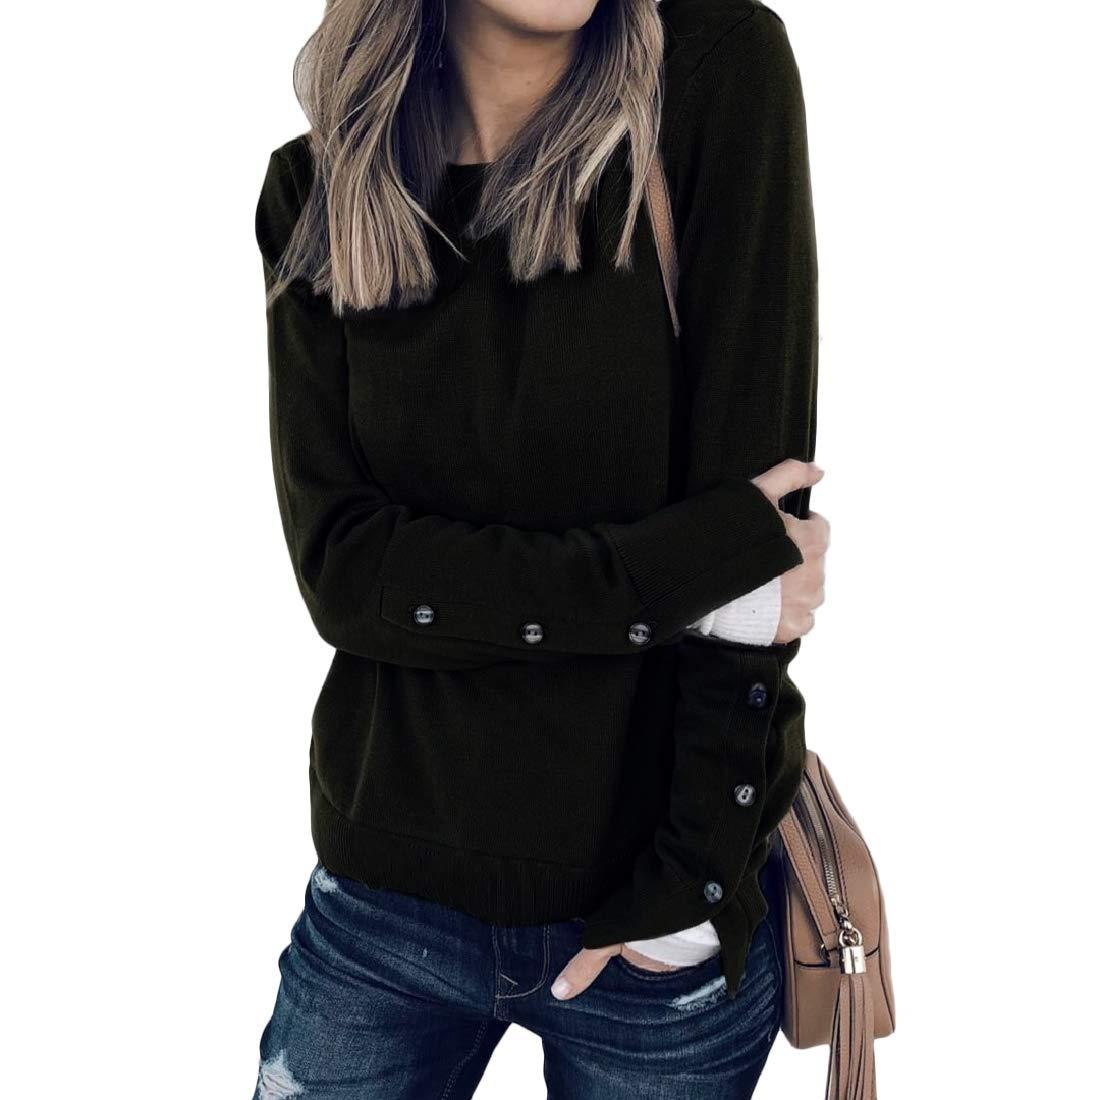 Coolred-Women Scoopneck Tee Basic Split Button Long Sleeve Shirt